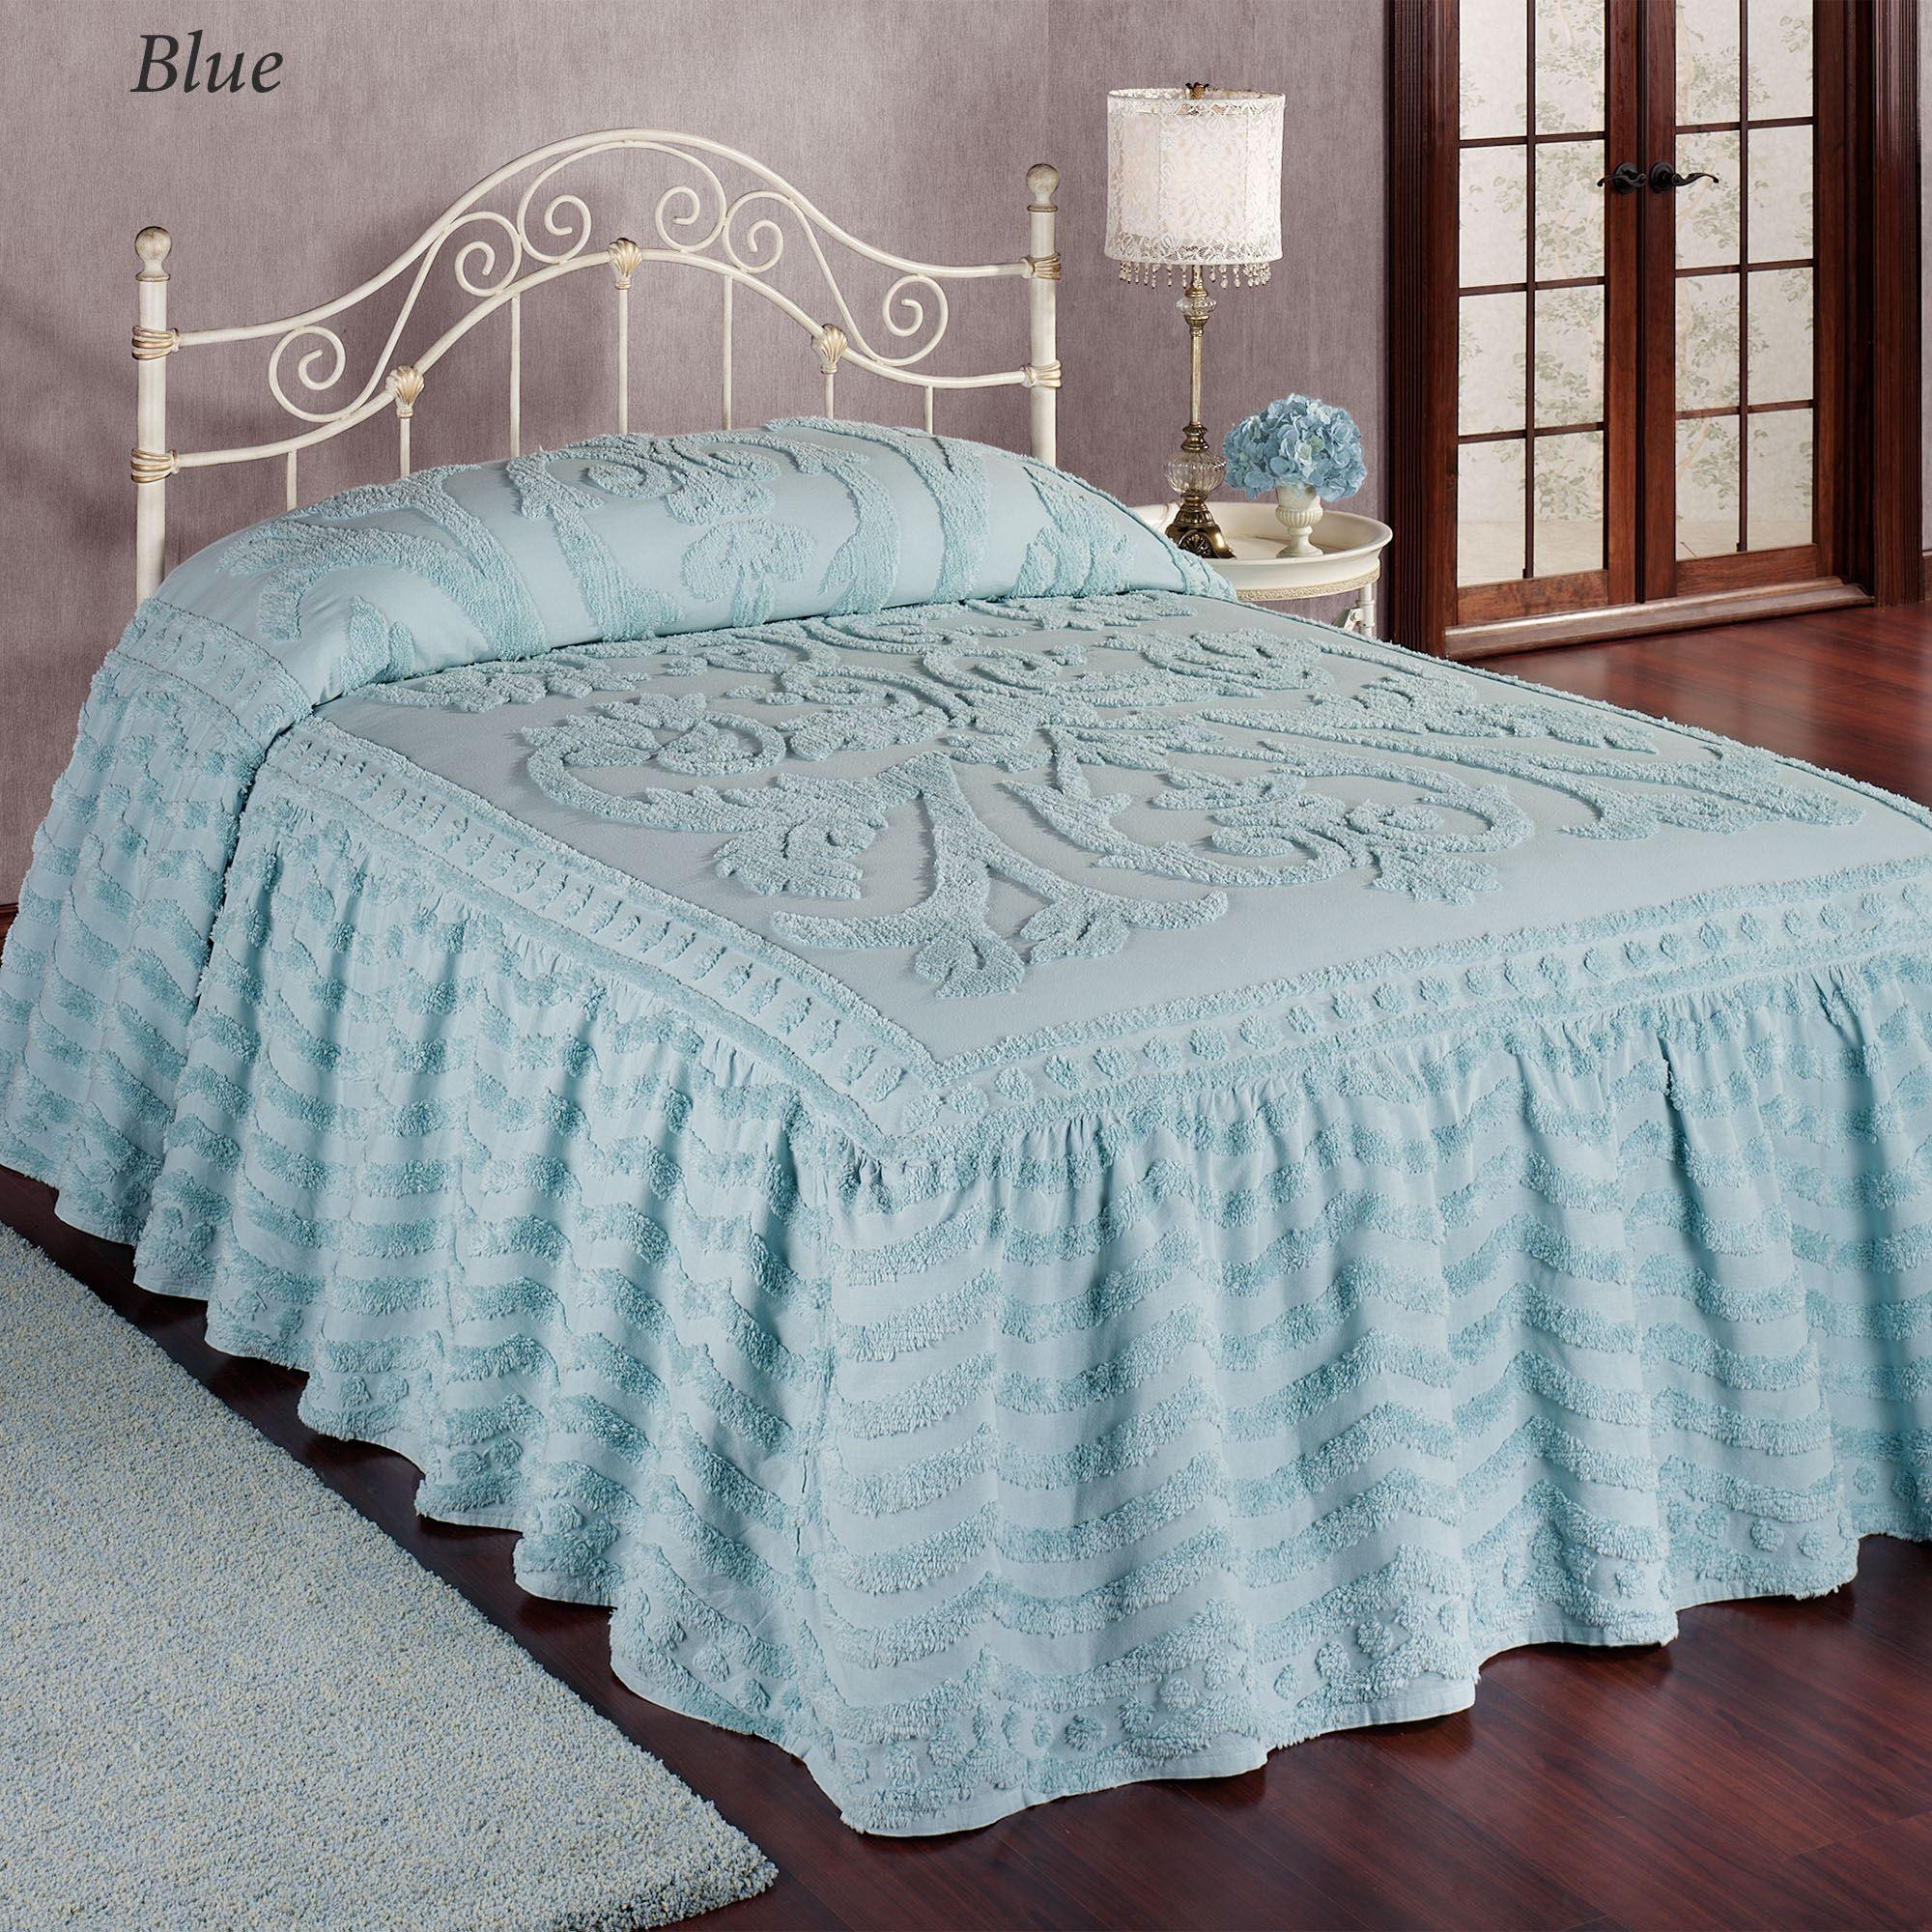 Allure Chenille Ruffled Flounce Oversized Bedspread Bedding